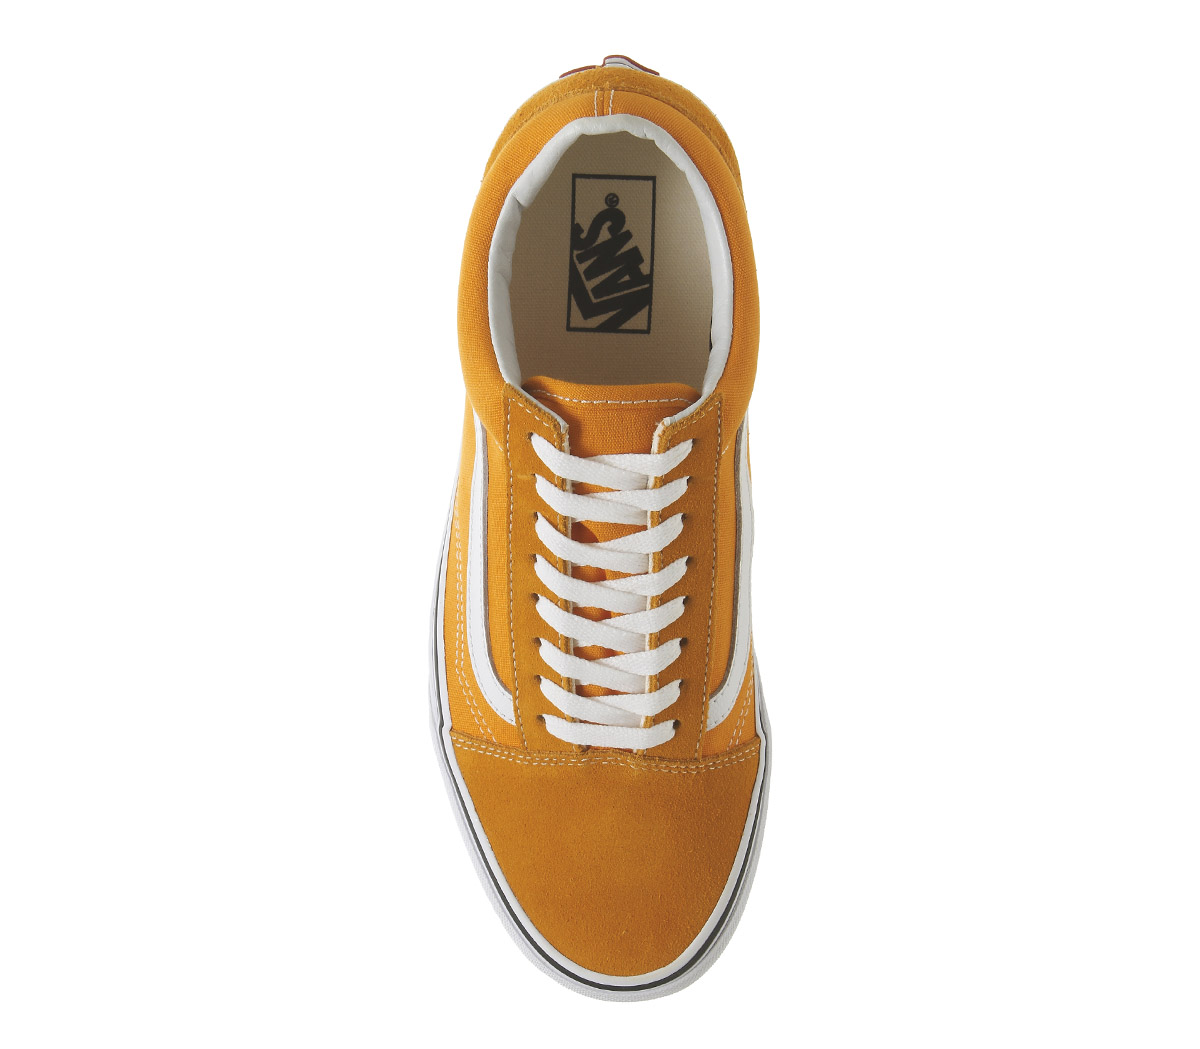 Vdw5qzvx Trainers Mens True Shoes Dark Cheddar White Vans Old Skool KJ1lFcT